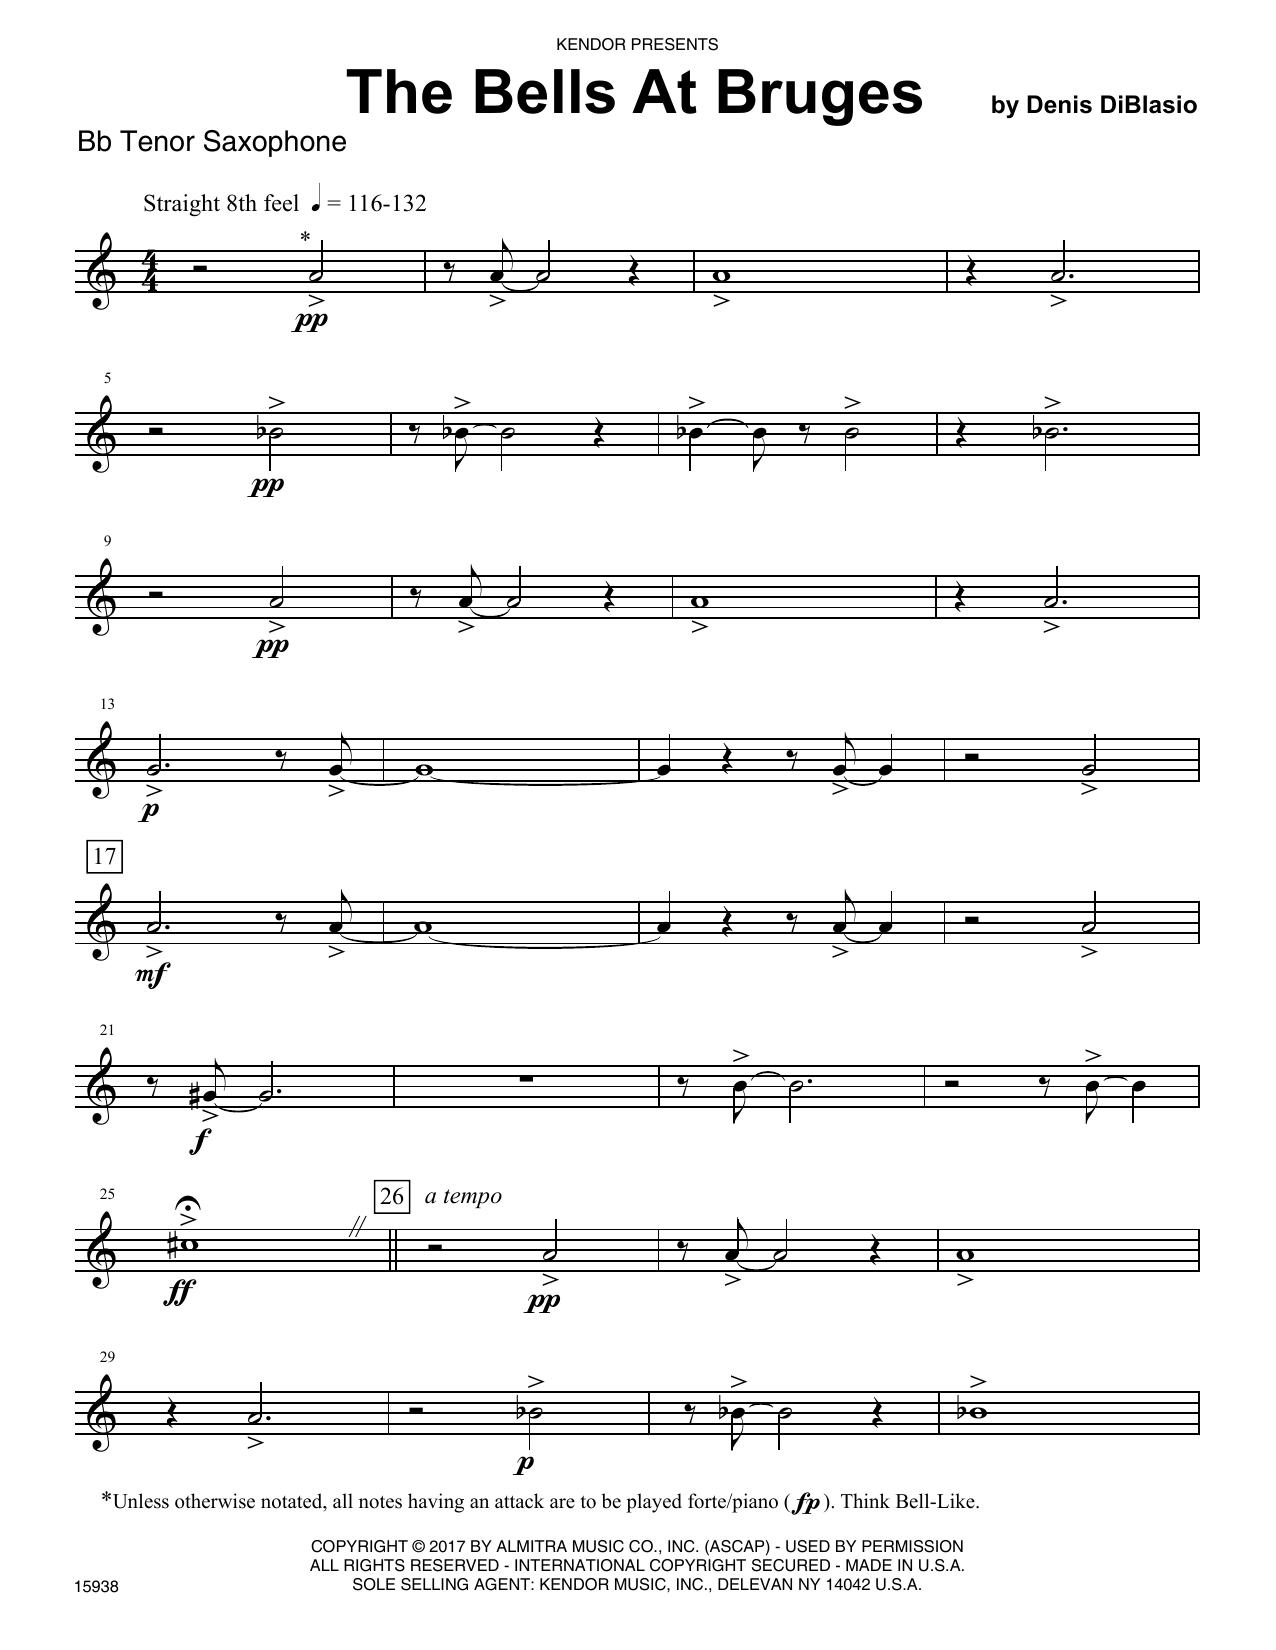 The Bells At Bruges - Bb Tenor Saxophone by Denis DiBlasio Woodwind  Ensemble Digital Sheet Music